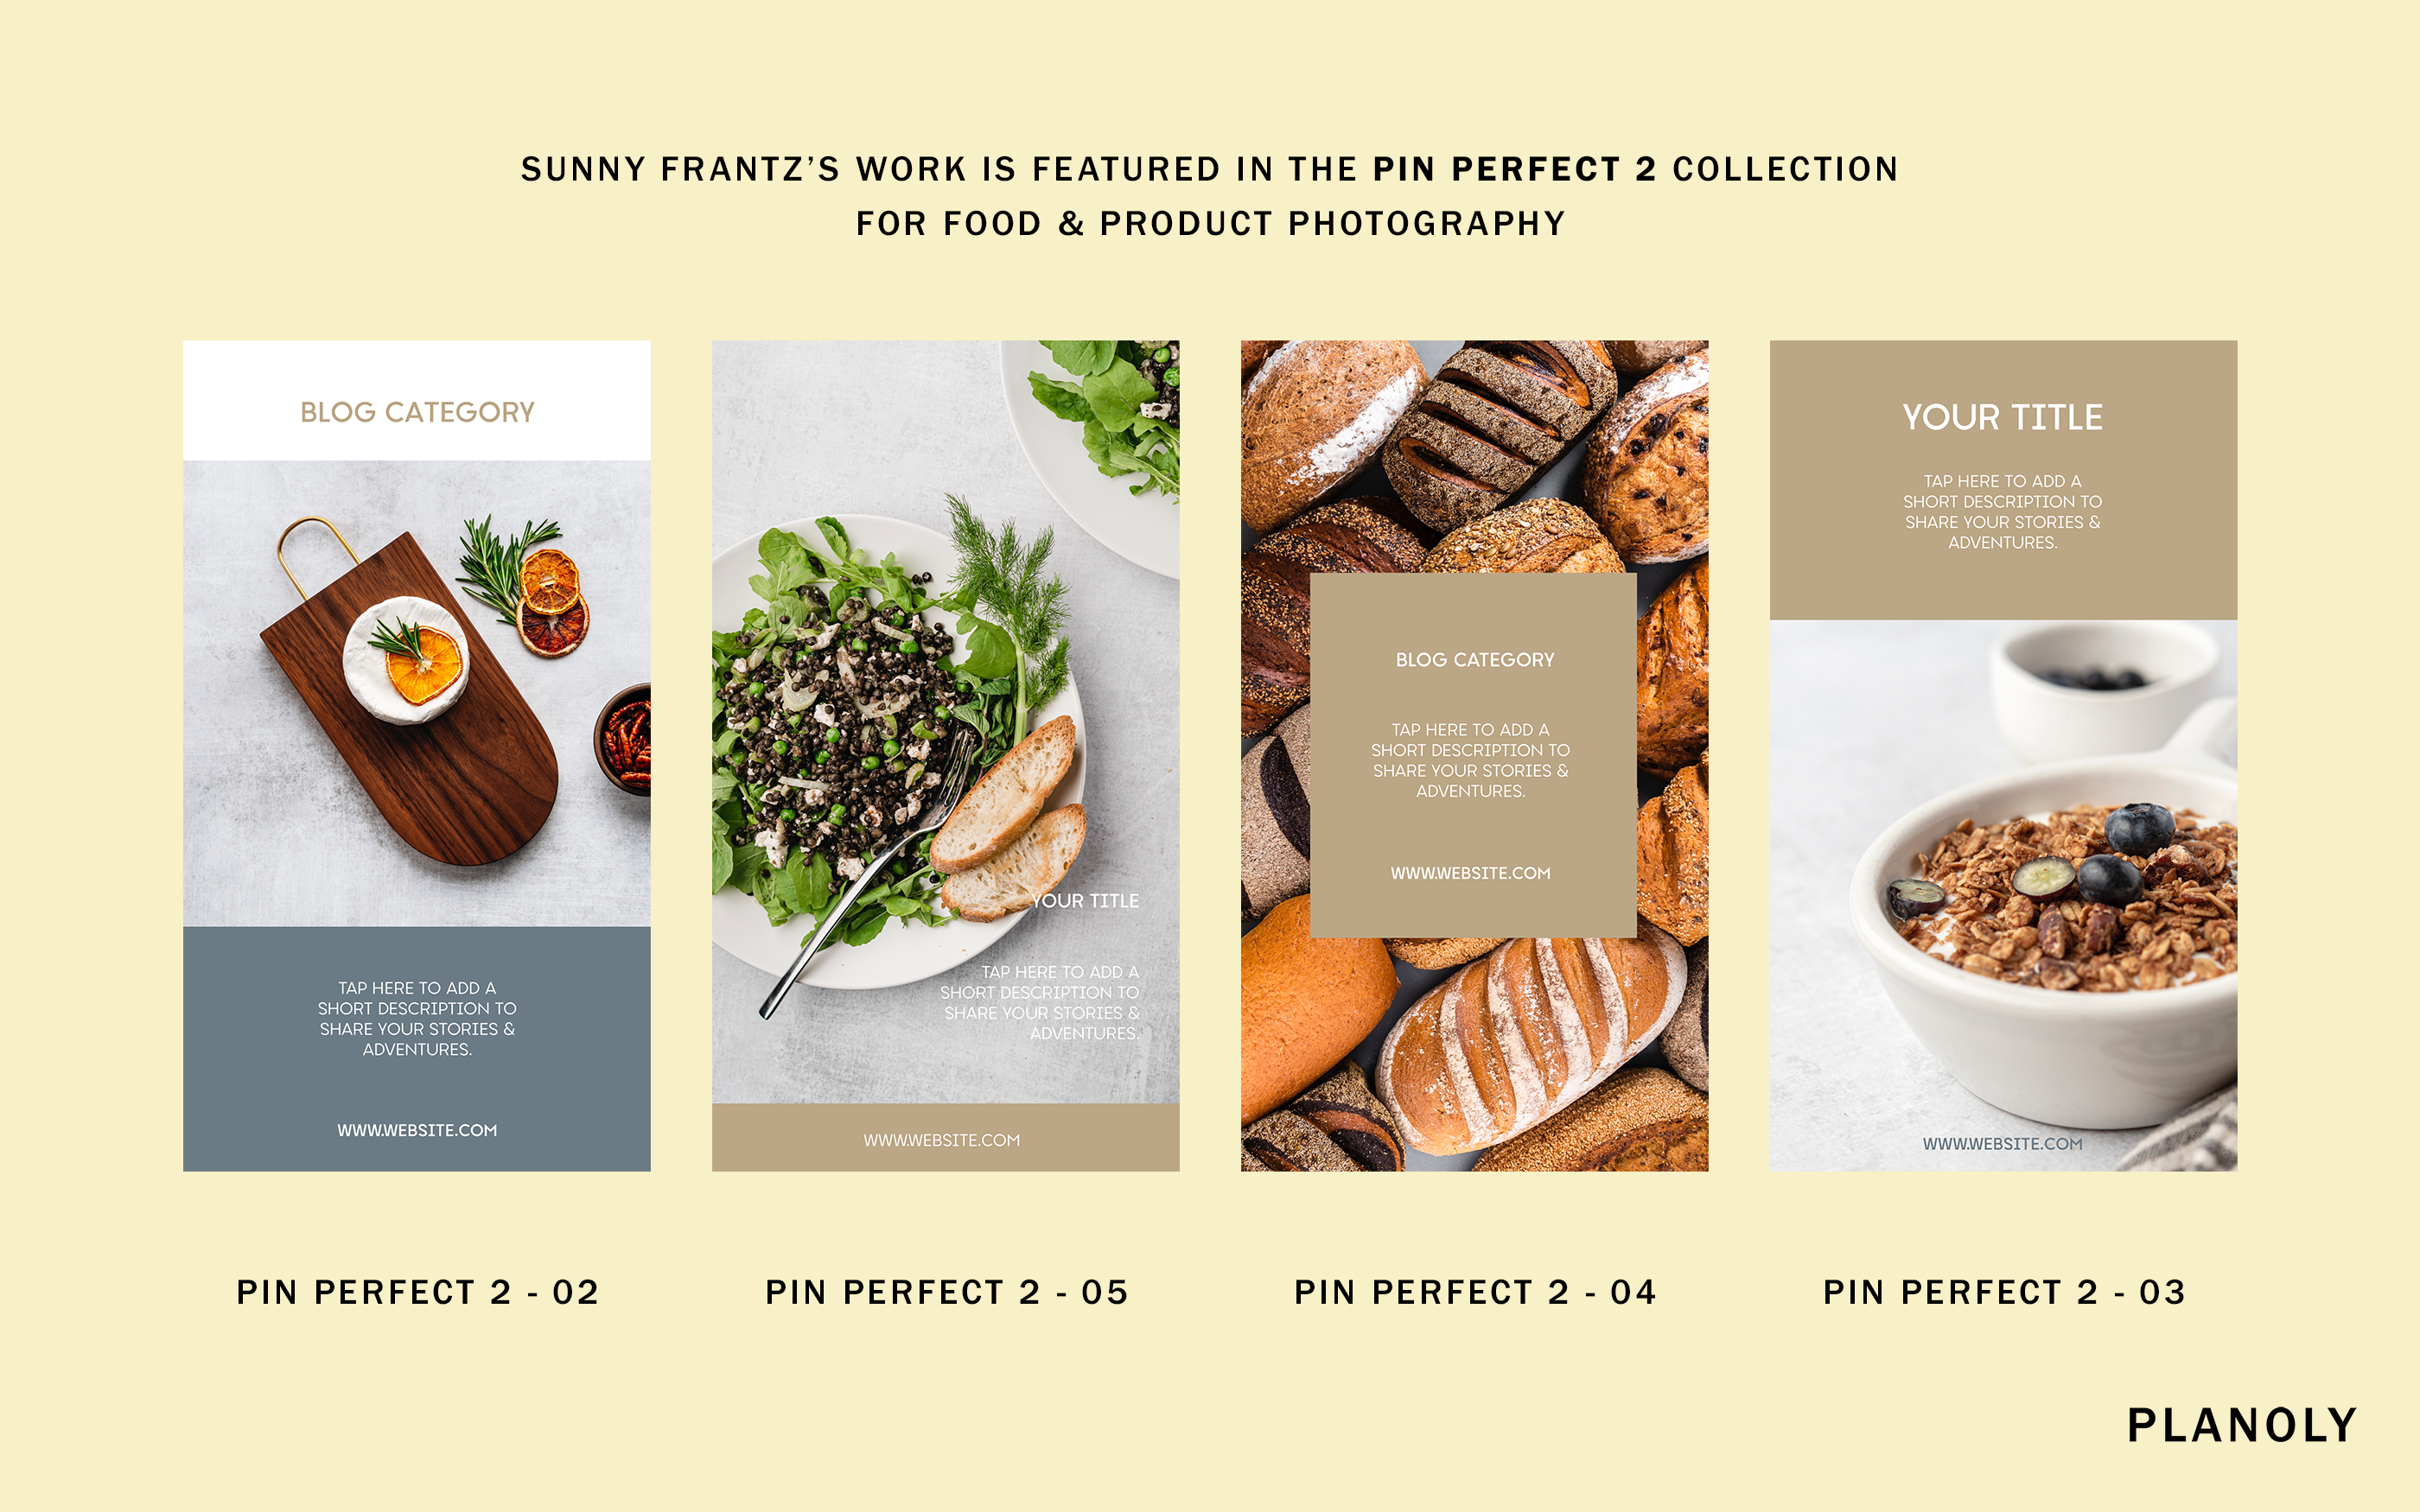 Food Styling Tips Sunny Frantz